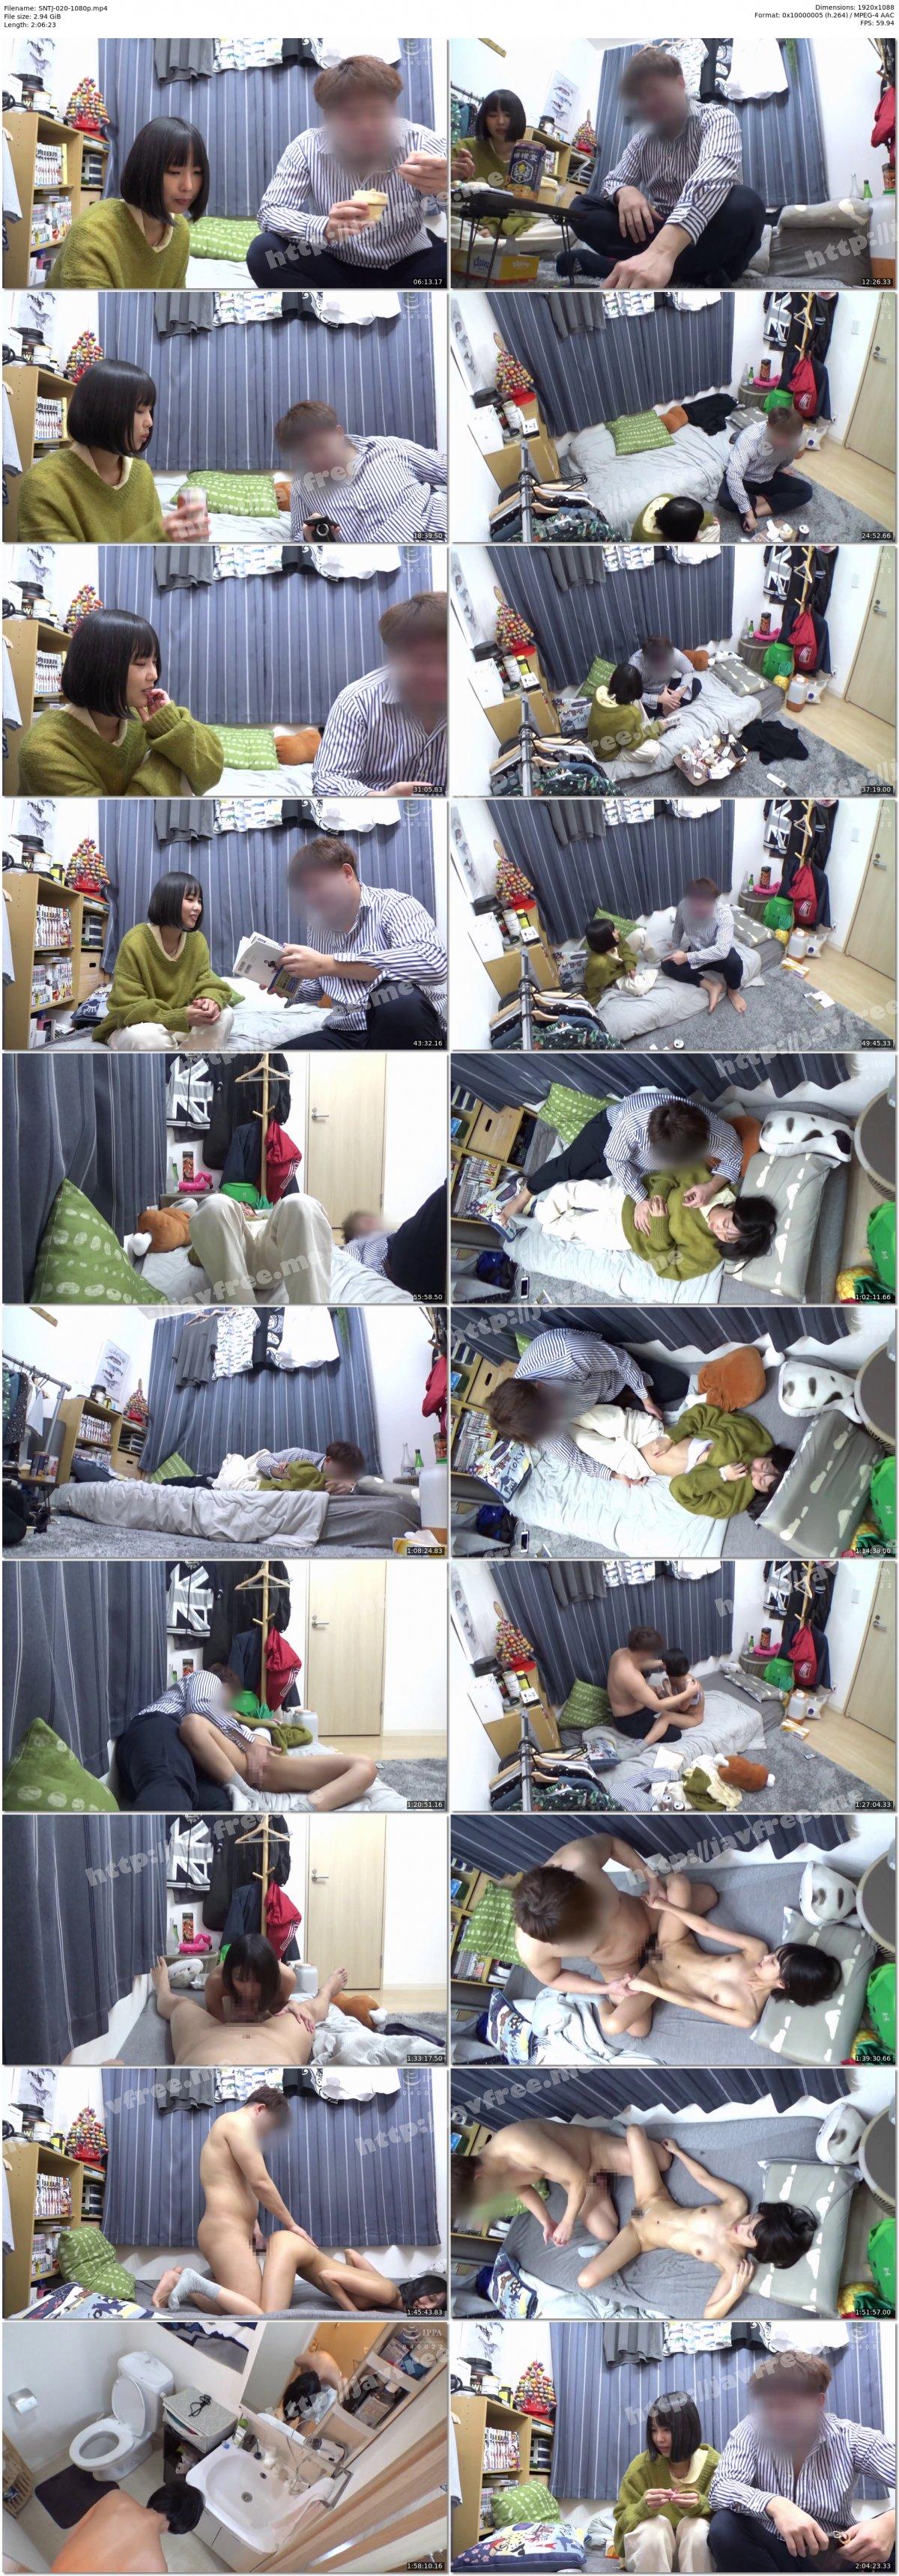 [HD][SNTJ-020] ナンパ連れ込みSEX隠し撮り・そのまま勝手にAV発売。する元ラグビー選手 Vol.20 - image SNTJ-020-1080p on https://javfree.me